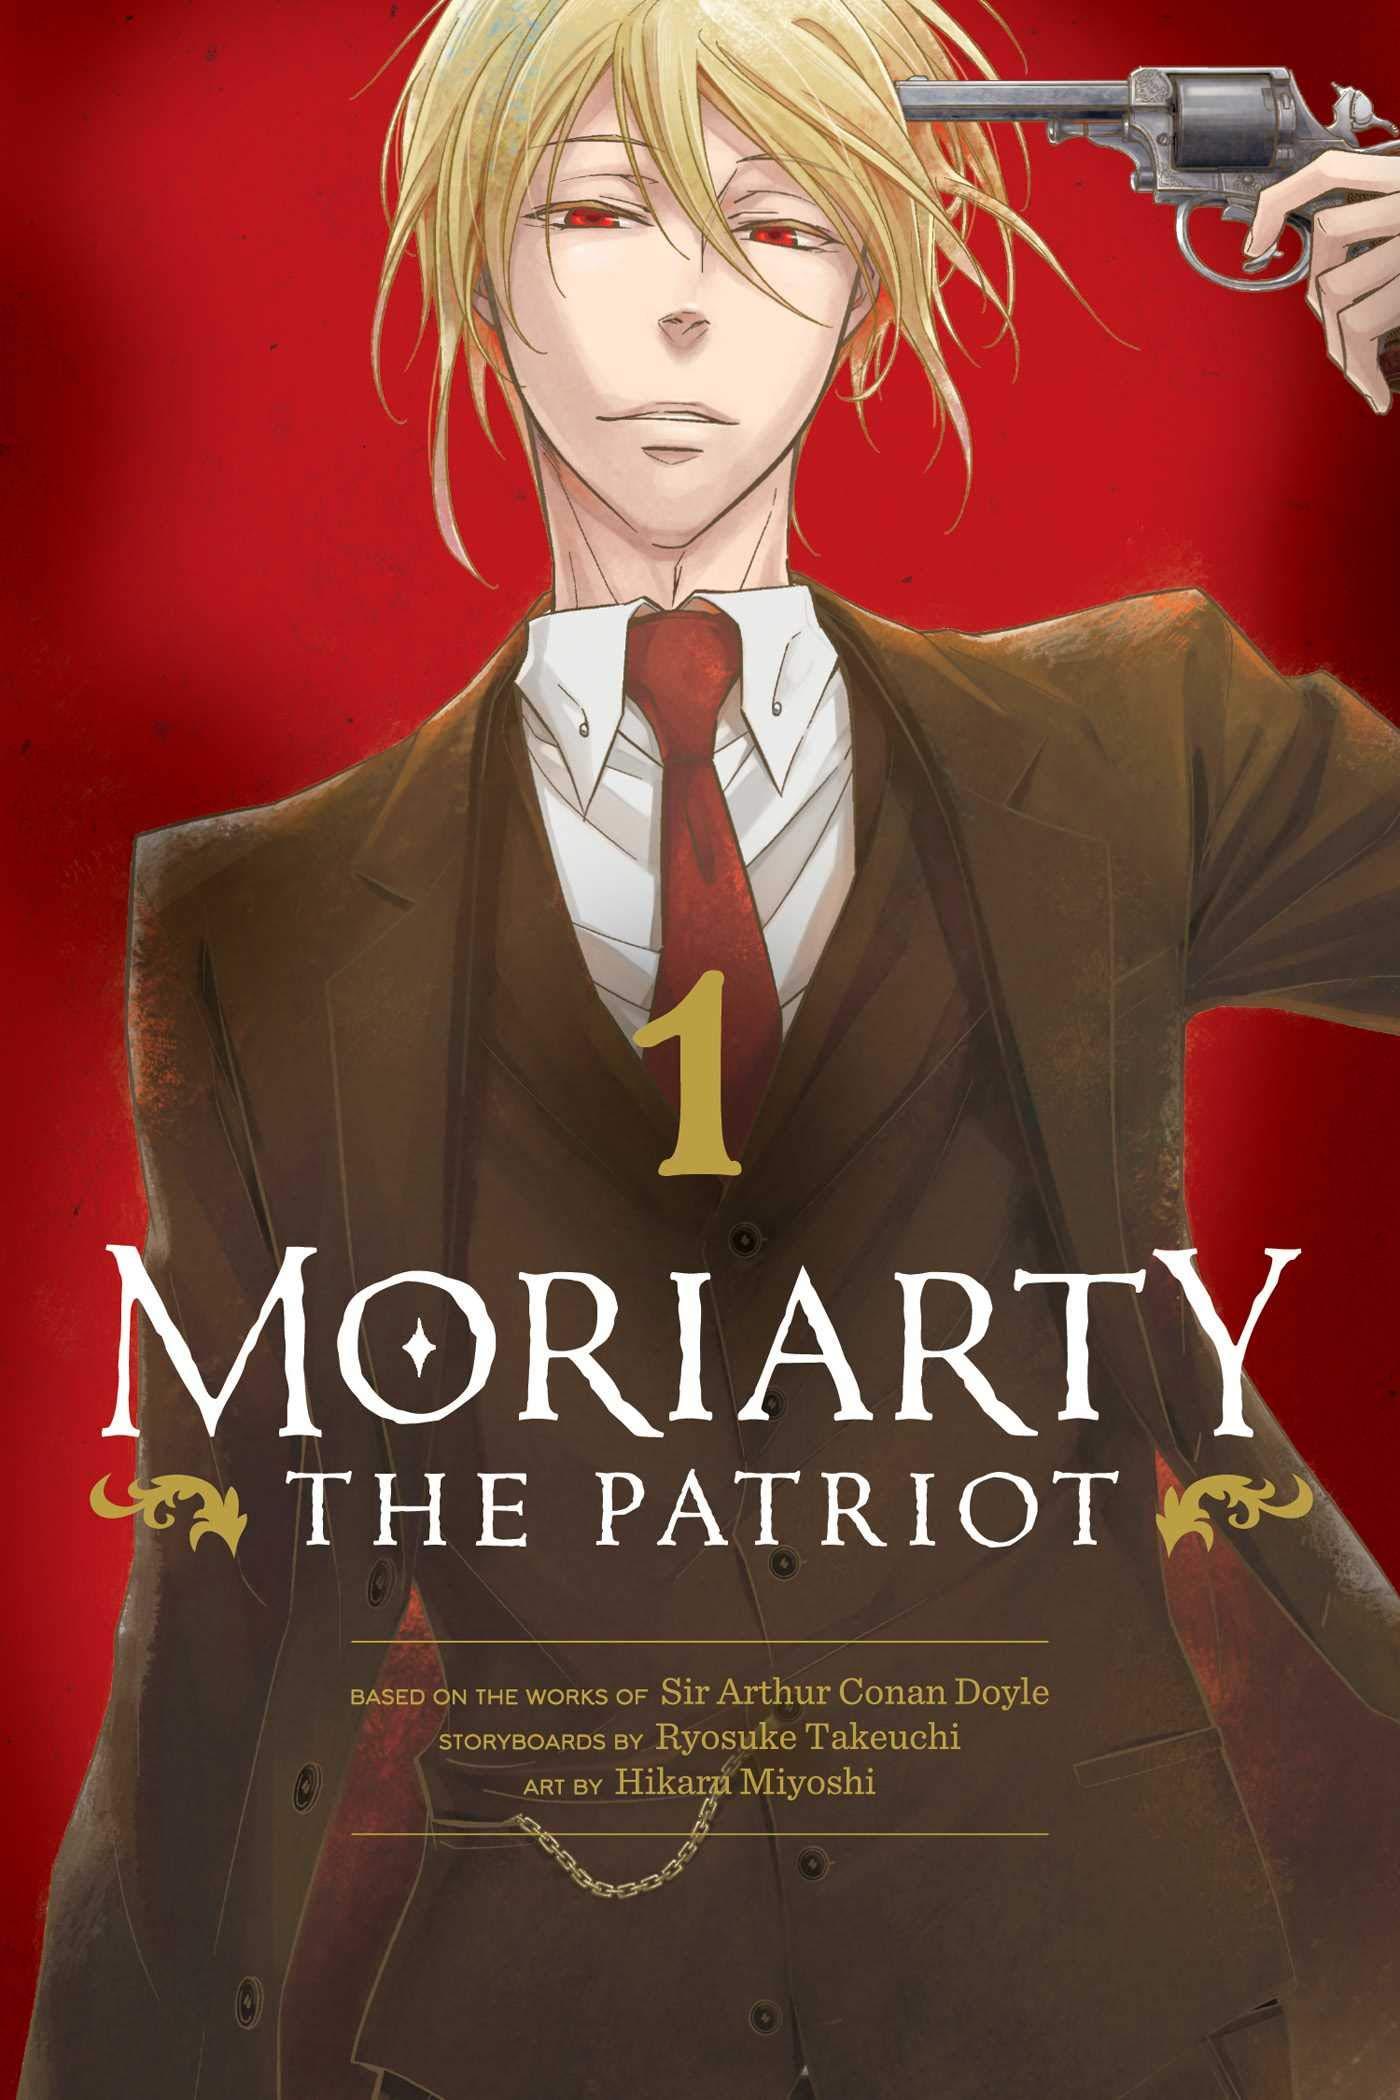 Moriarty the Patriot, Vol. 1 (1): Takeuchi, Ryosuke, Miyoshi, Hikaru,  Doyle, Sir Arthur Conan: 9781974717156: Amazon.com: Books